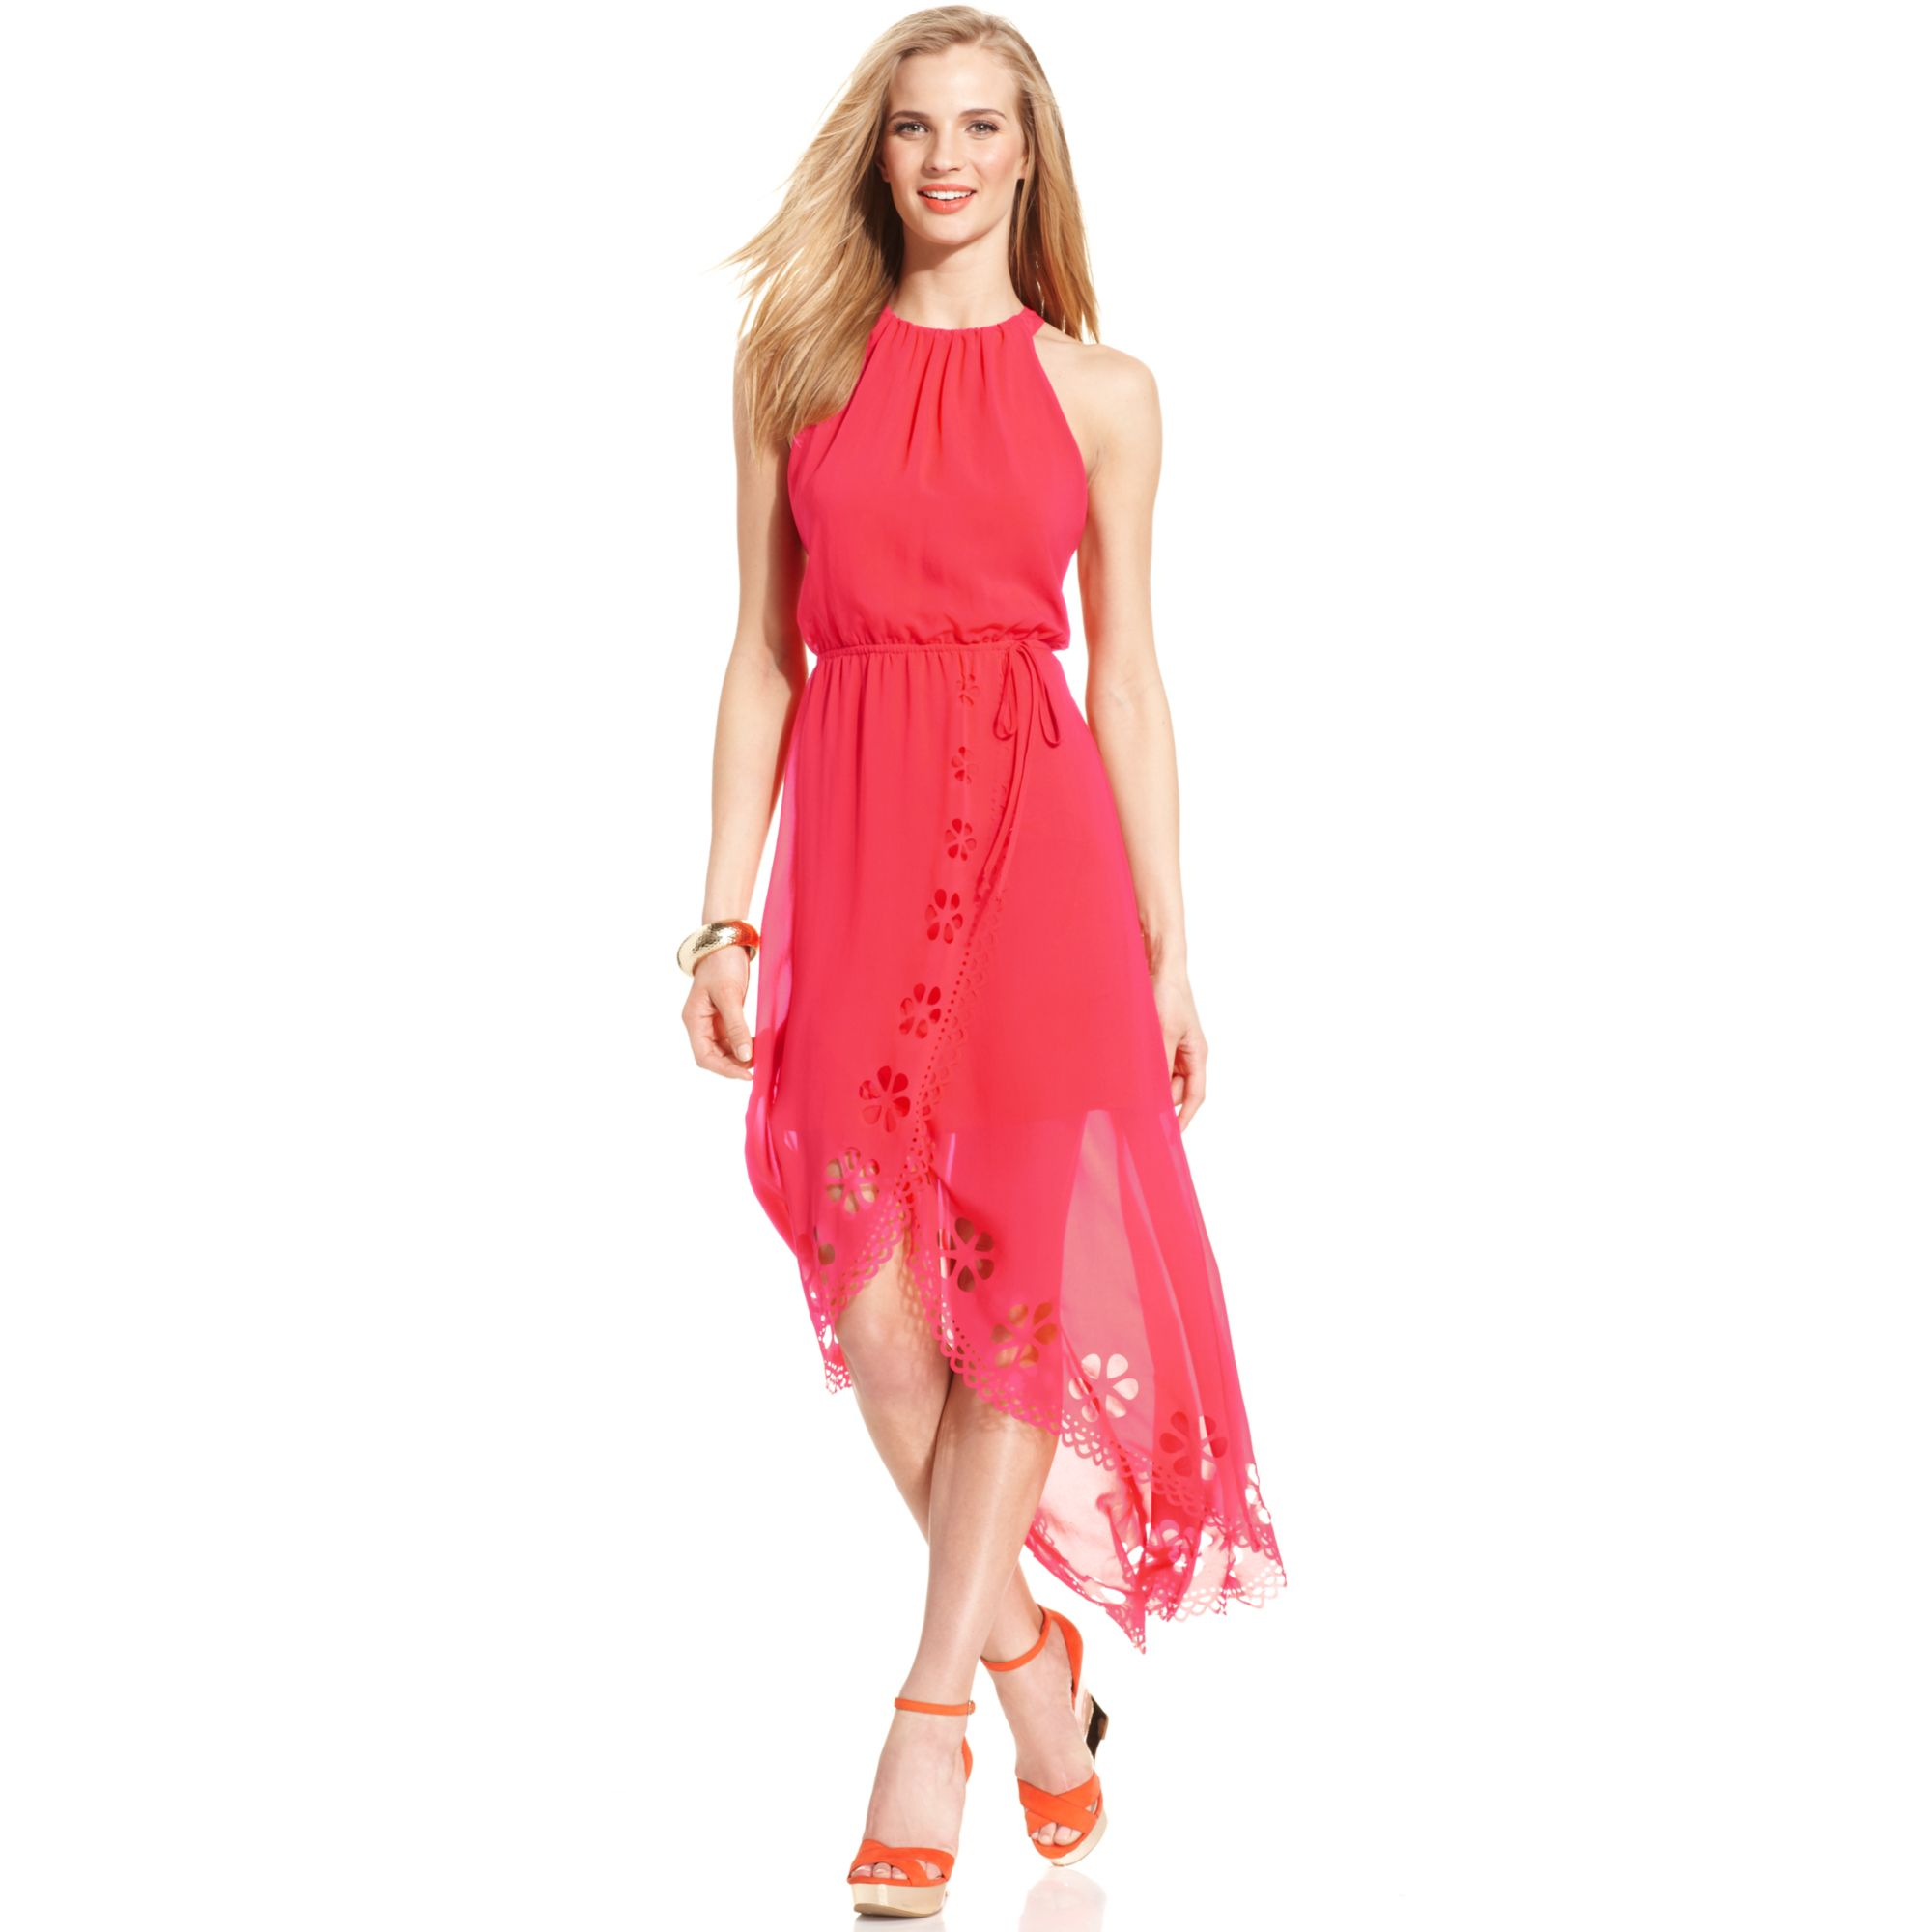 Jessica simpson jersey maxi dress